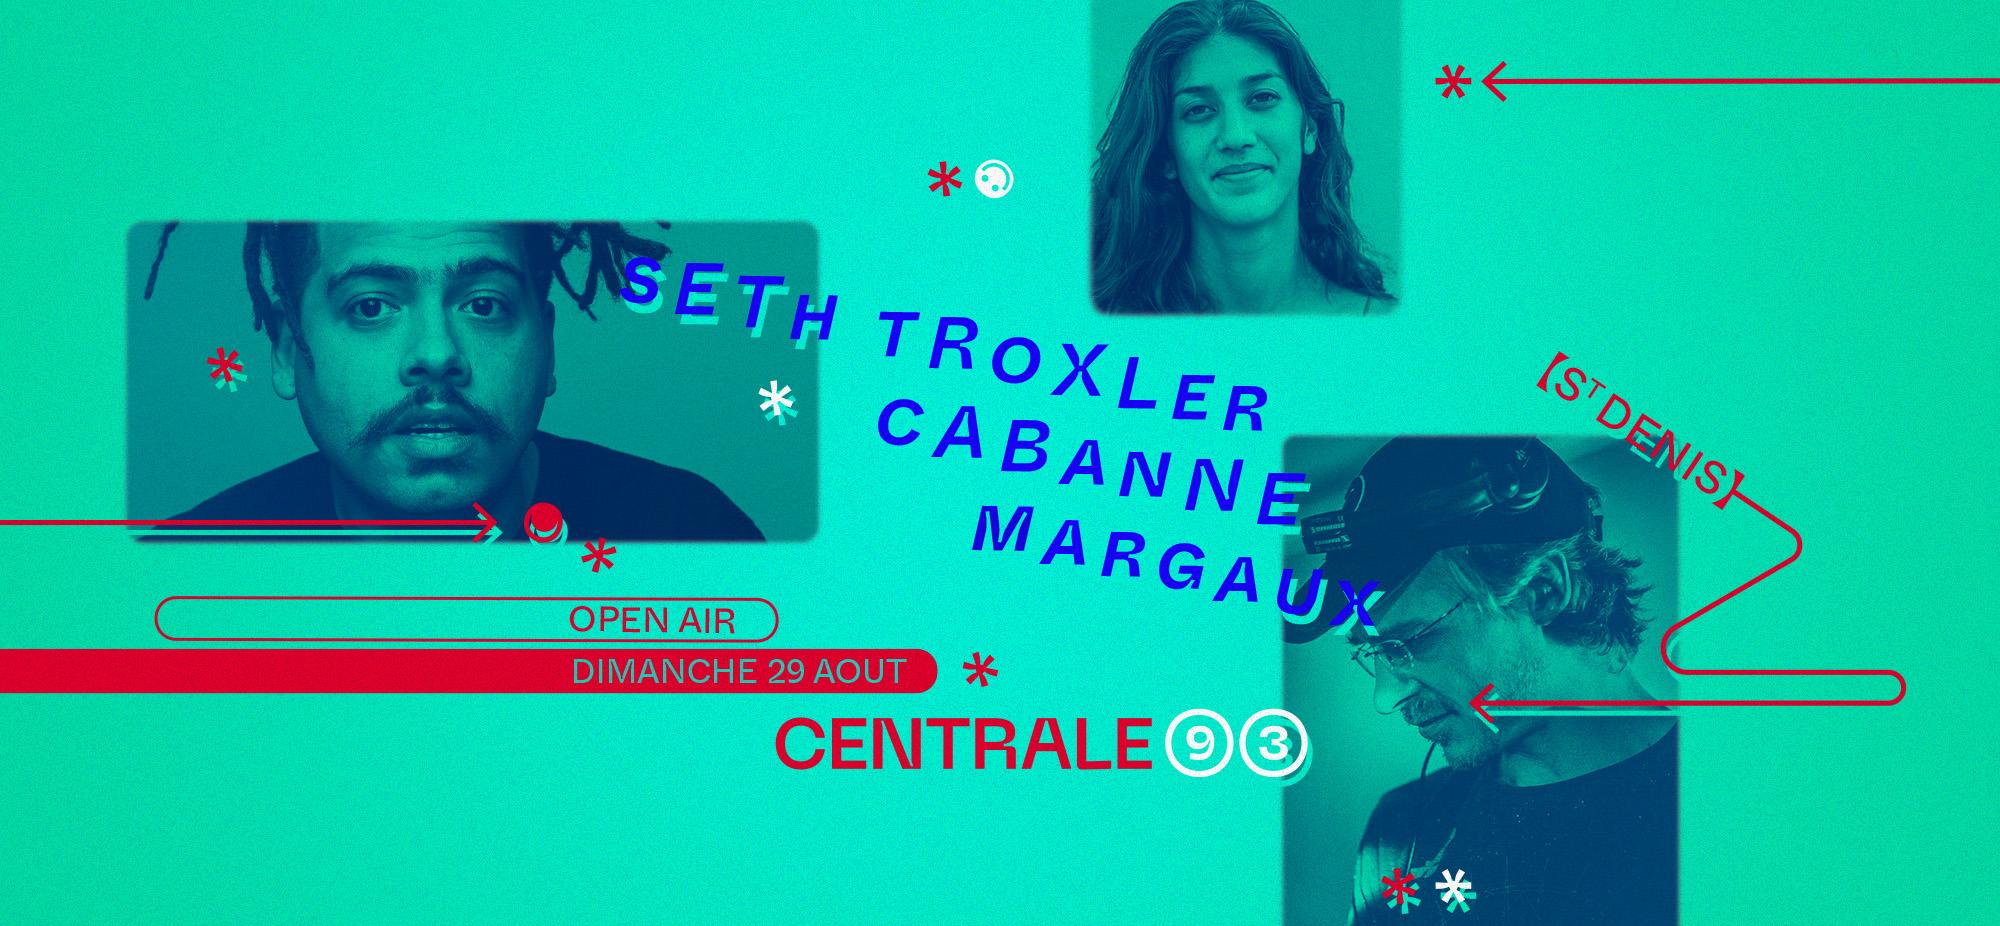 Centrale93: Seth Troxler, Cabanne, Margaux